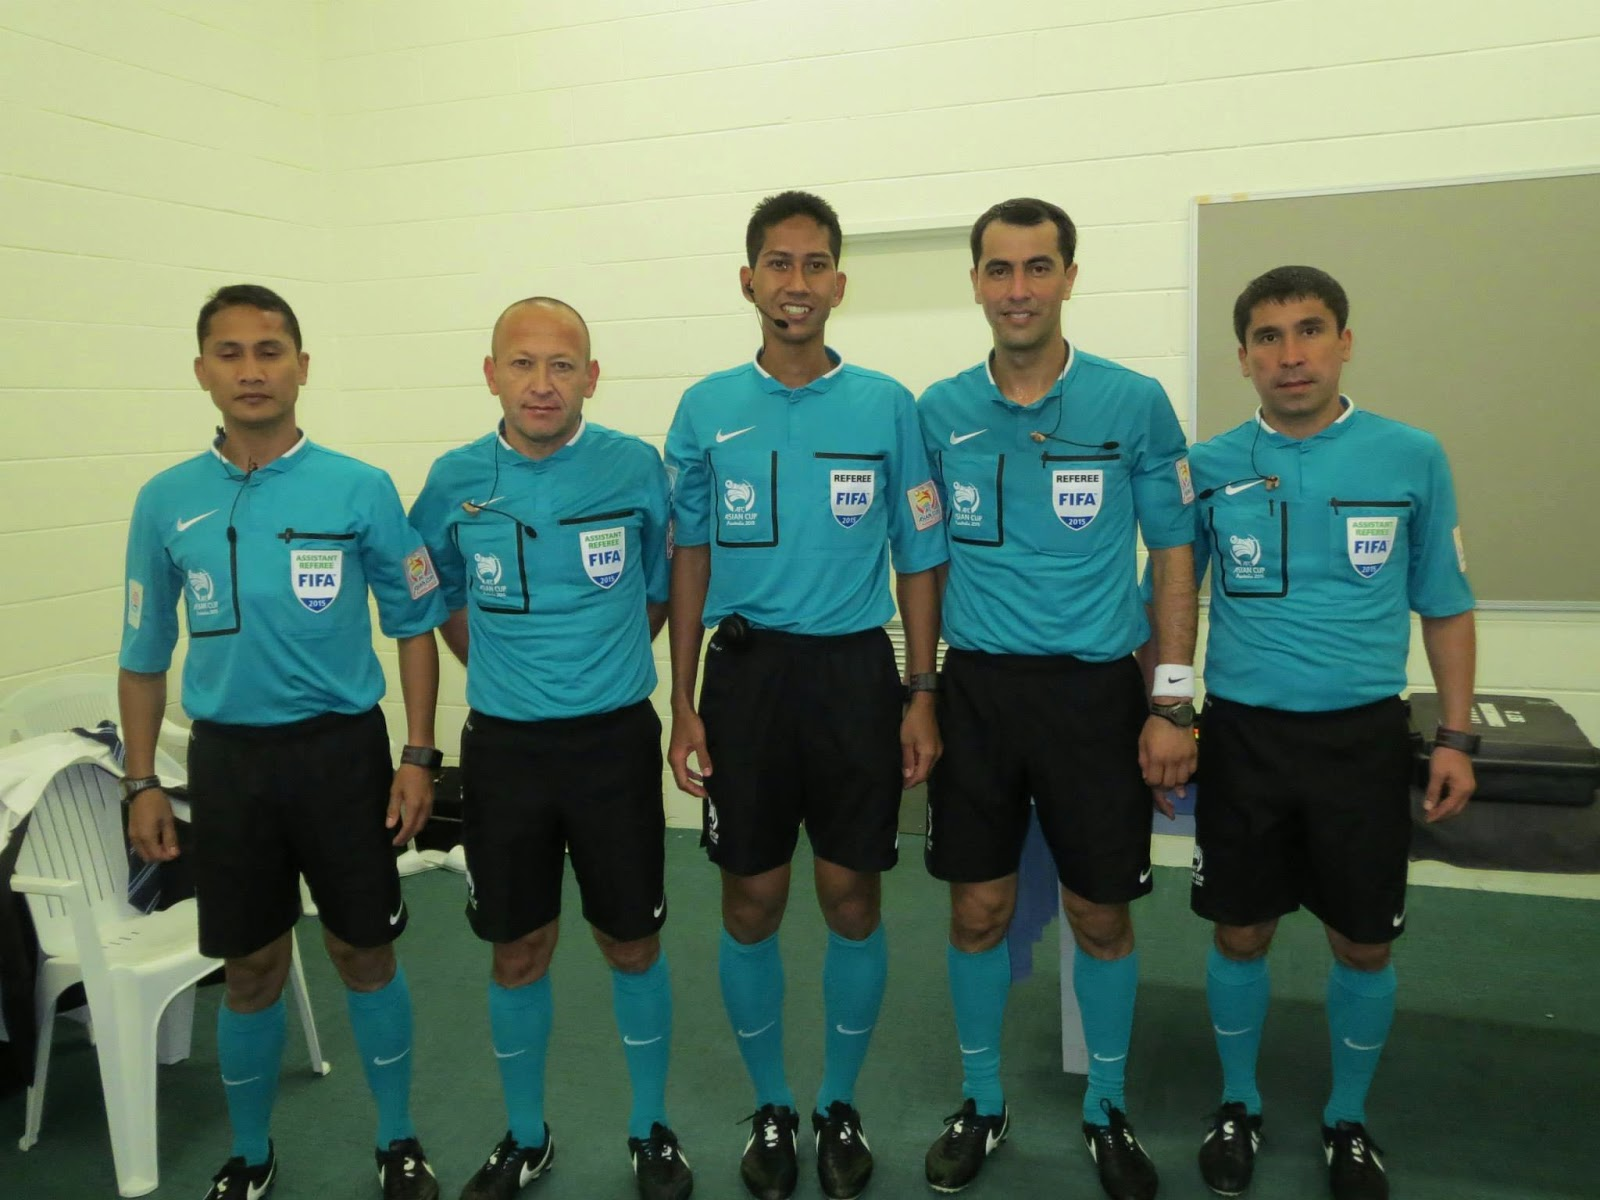 2015 AFC ASIAN CUP – Australia vs Kuwait – Irmatov (Uzbekistan)